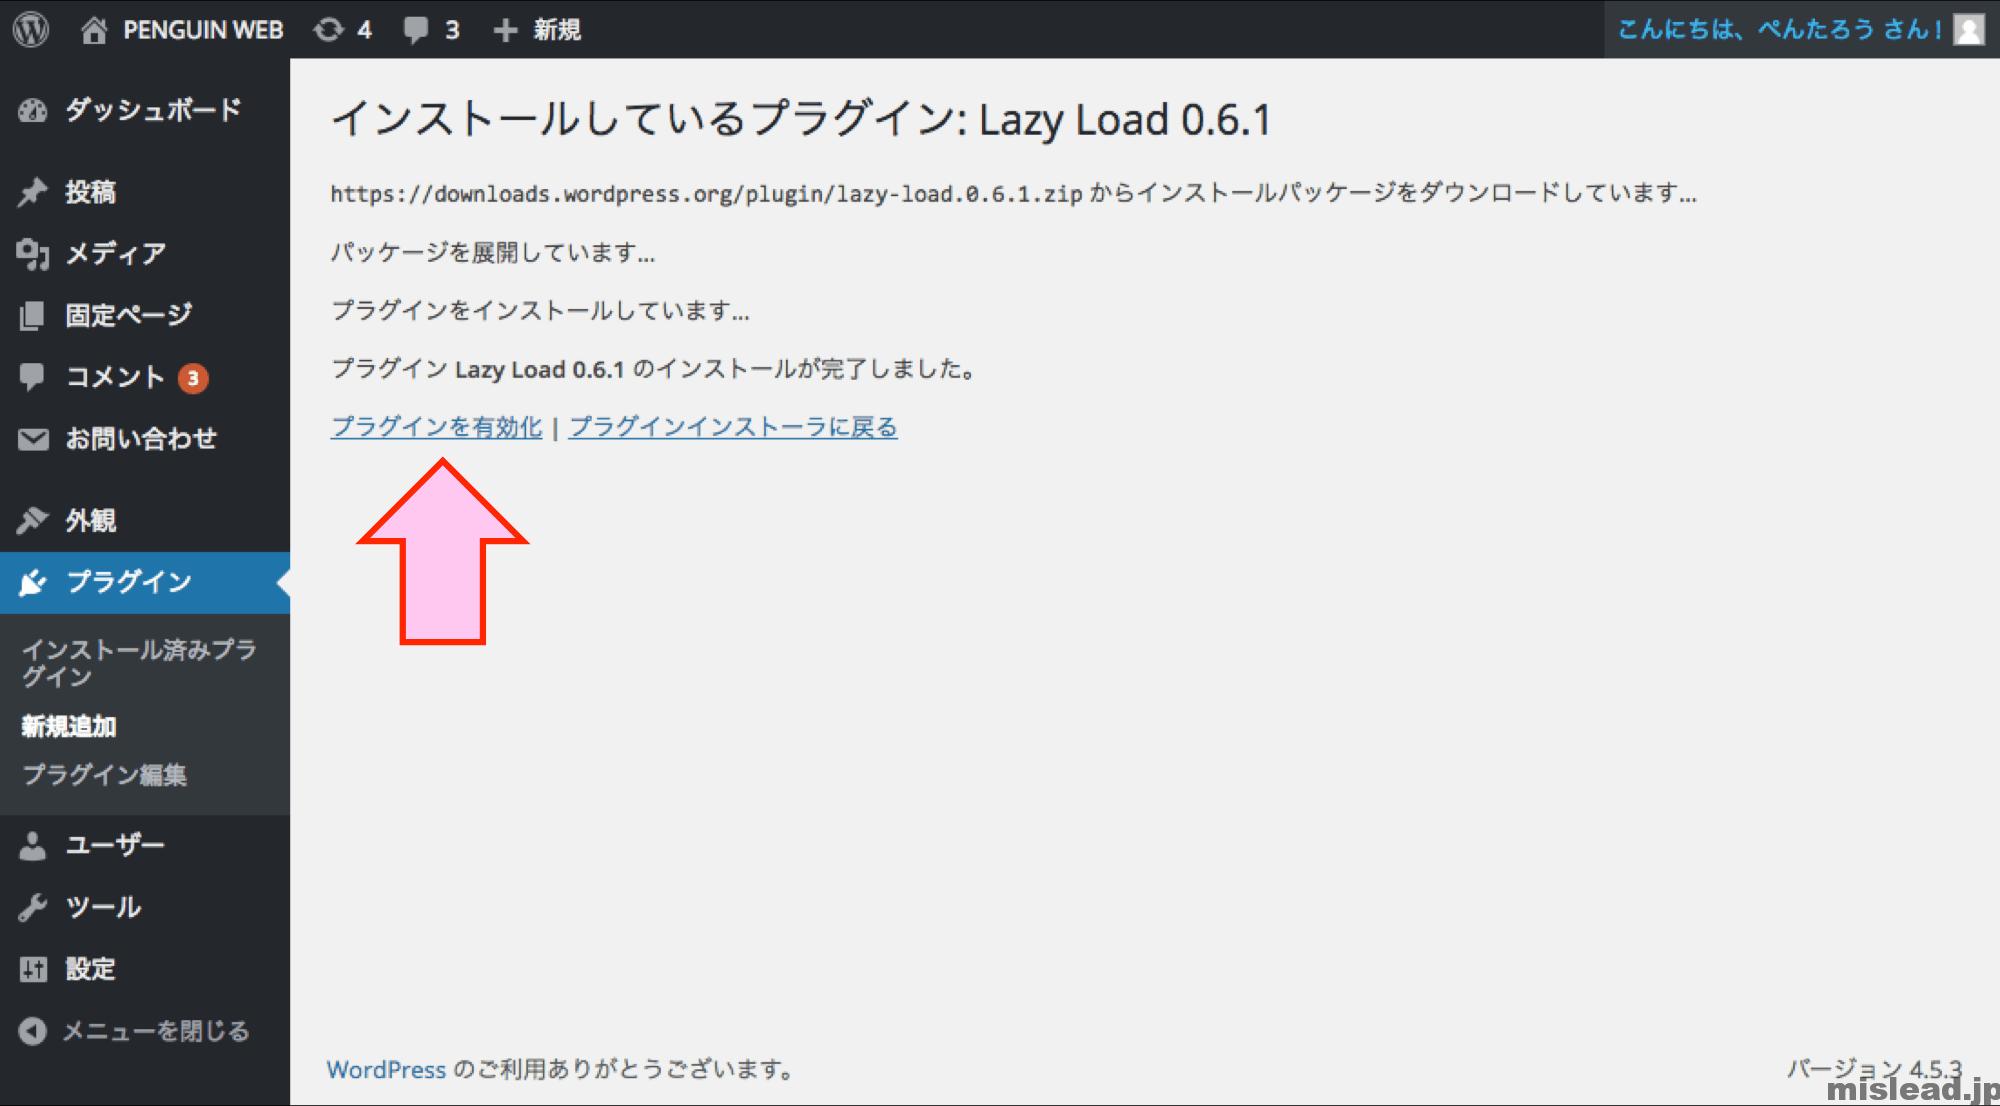 Lazy Load プラグイン インストール